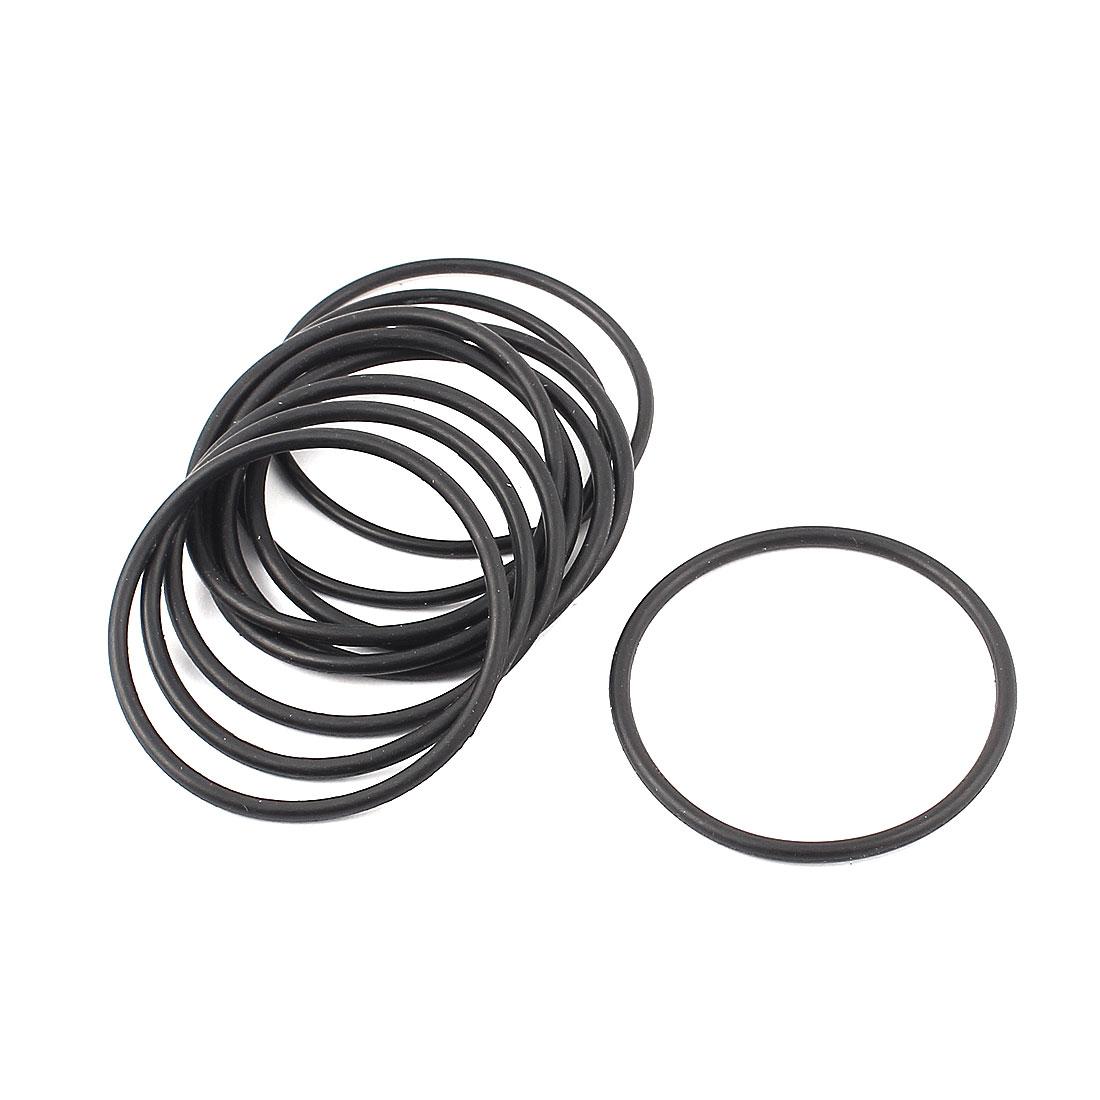 45mm Dia Rubber Oil Seal Sealing O Ring Black 10pcs